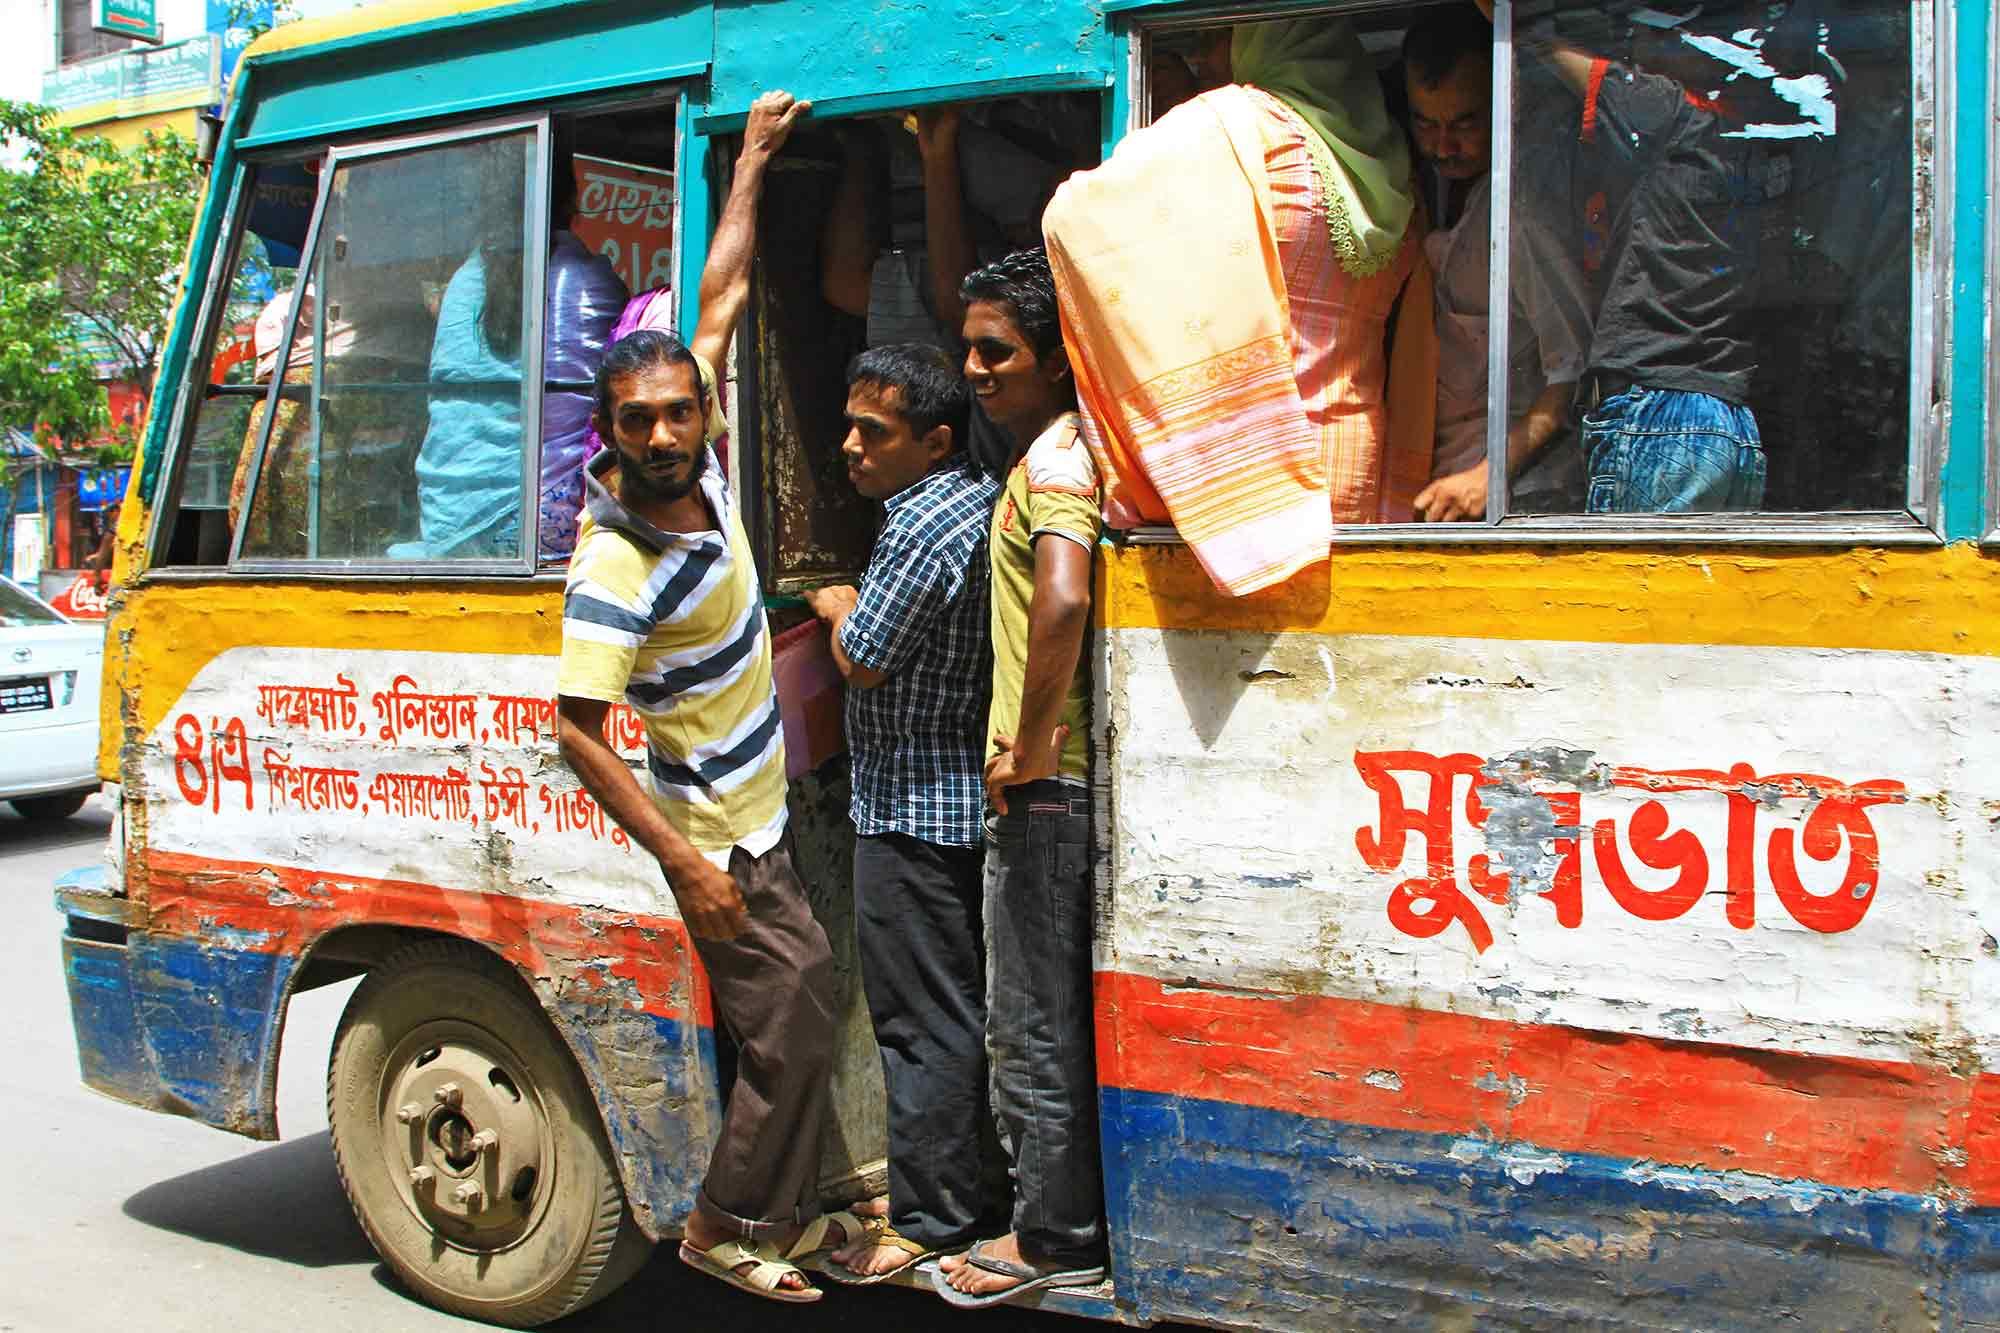 Bus transport in Dhaka. © Ulli Maier & Nisa Maier